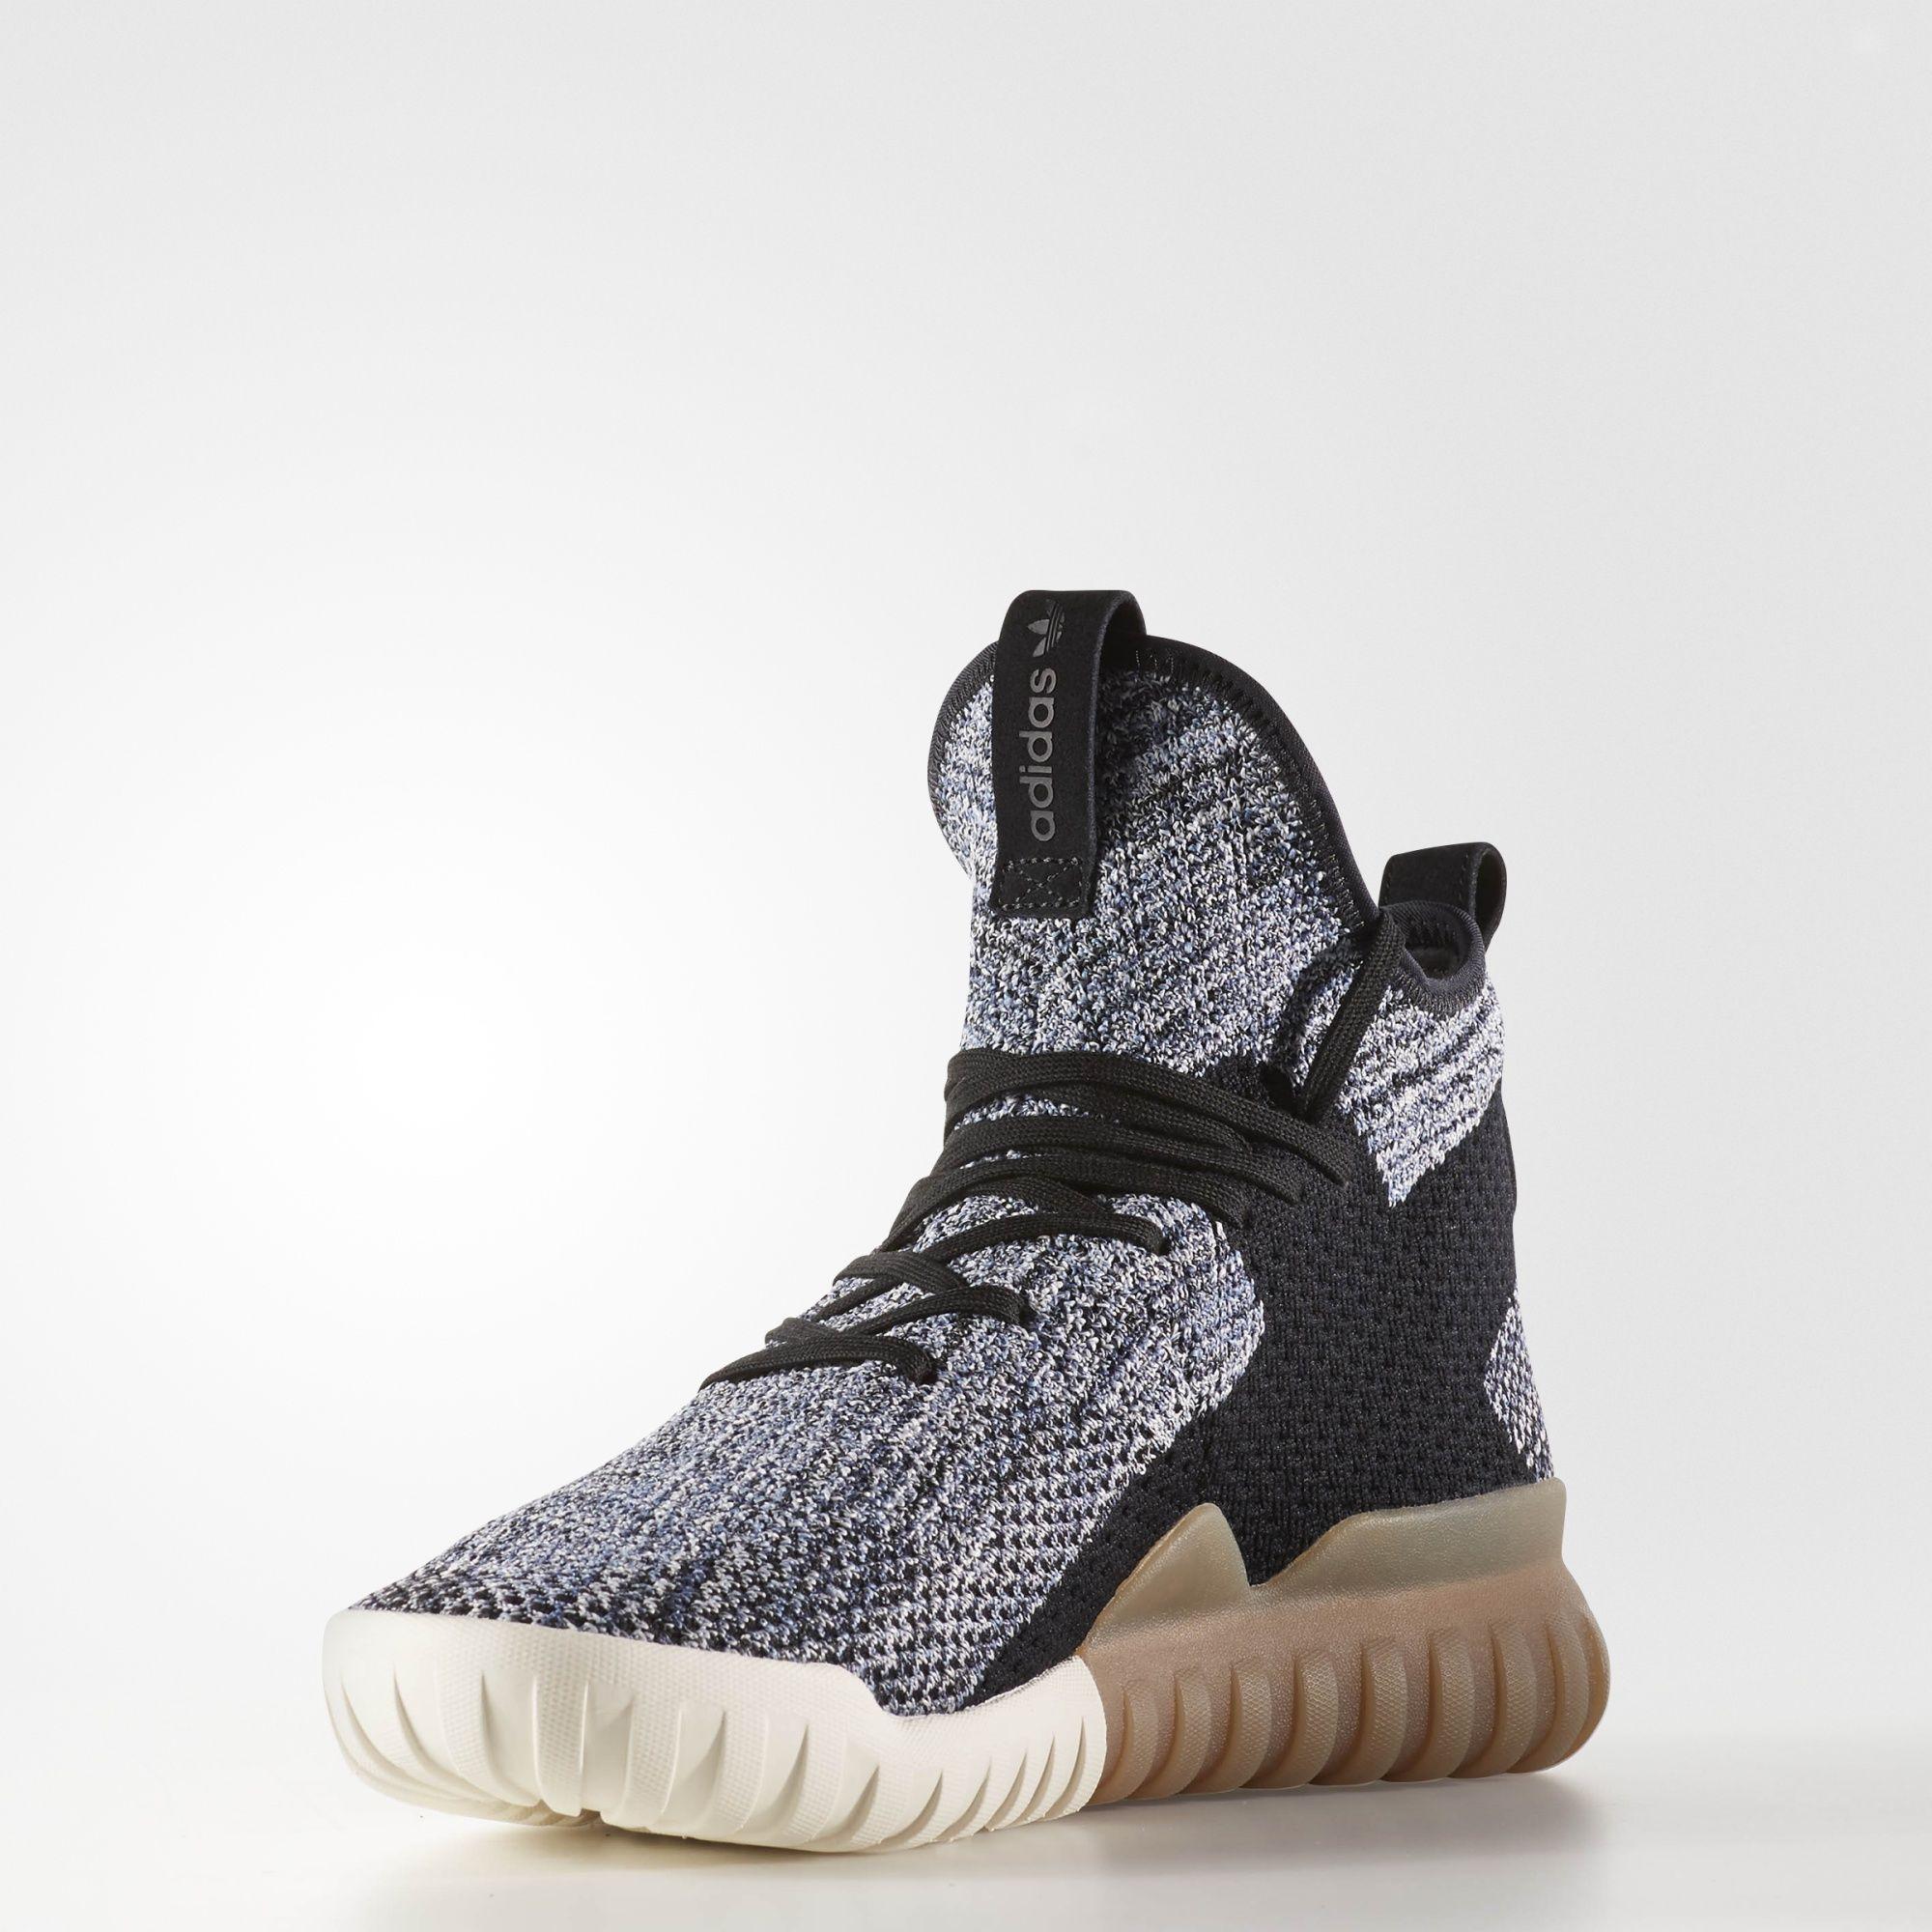 282c78ee7621 adidas Originals Tubular X Primeknit Sneakers - SPORT SHOES Lifestyle Shoes